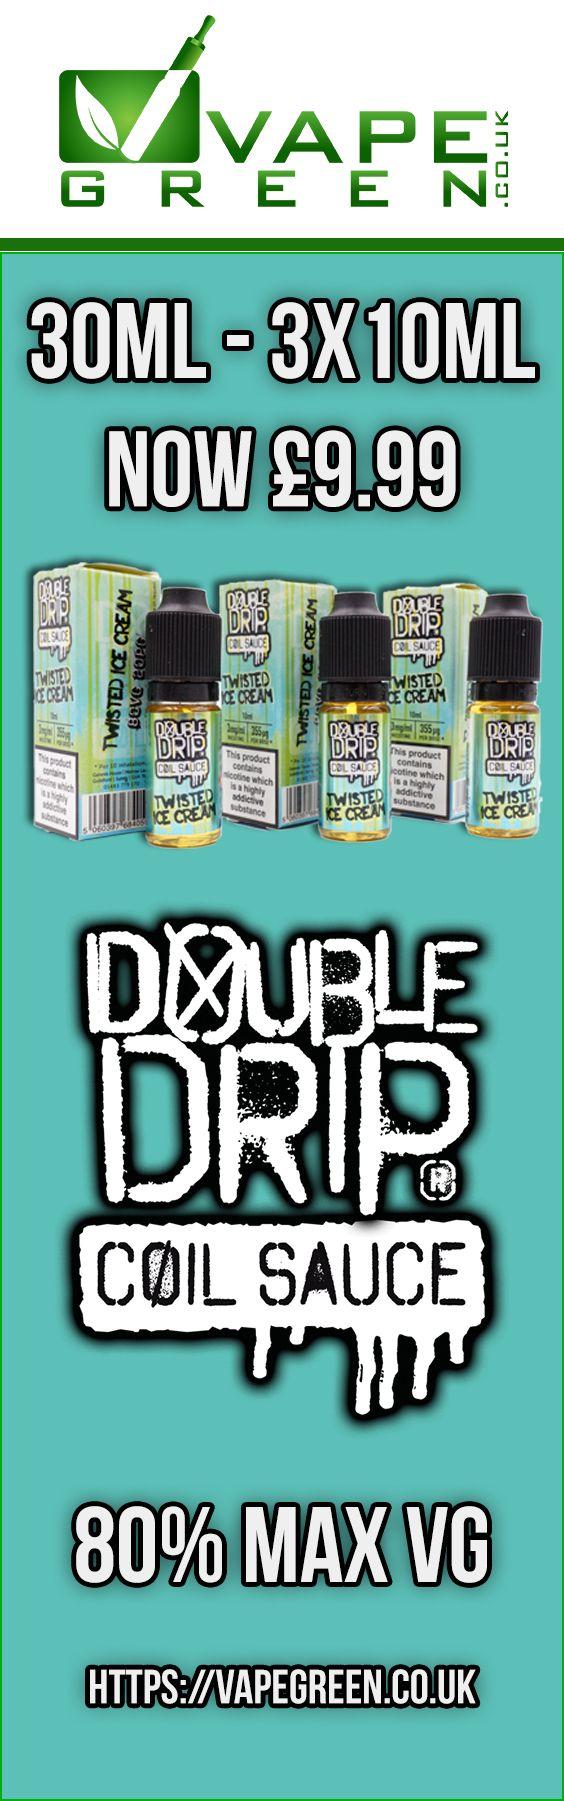 Double Drip by Coil Sauce Max VG E-liquids only £9.99 for 30ml at https://VapeGreen.co.uk #vape #vaping #eliquid #vapegreen #ecig #ejuice #vapeuk #ukvapers